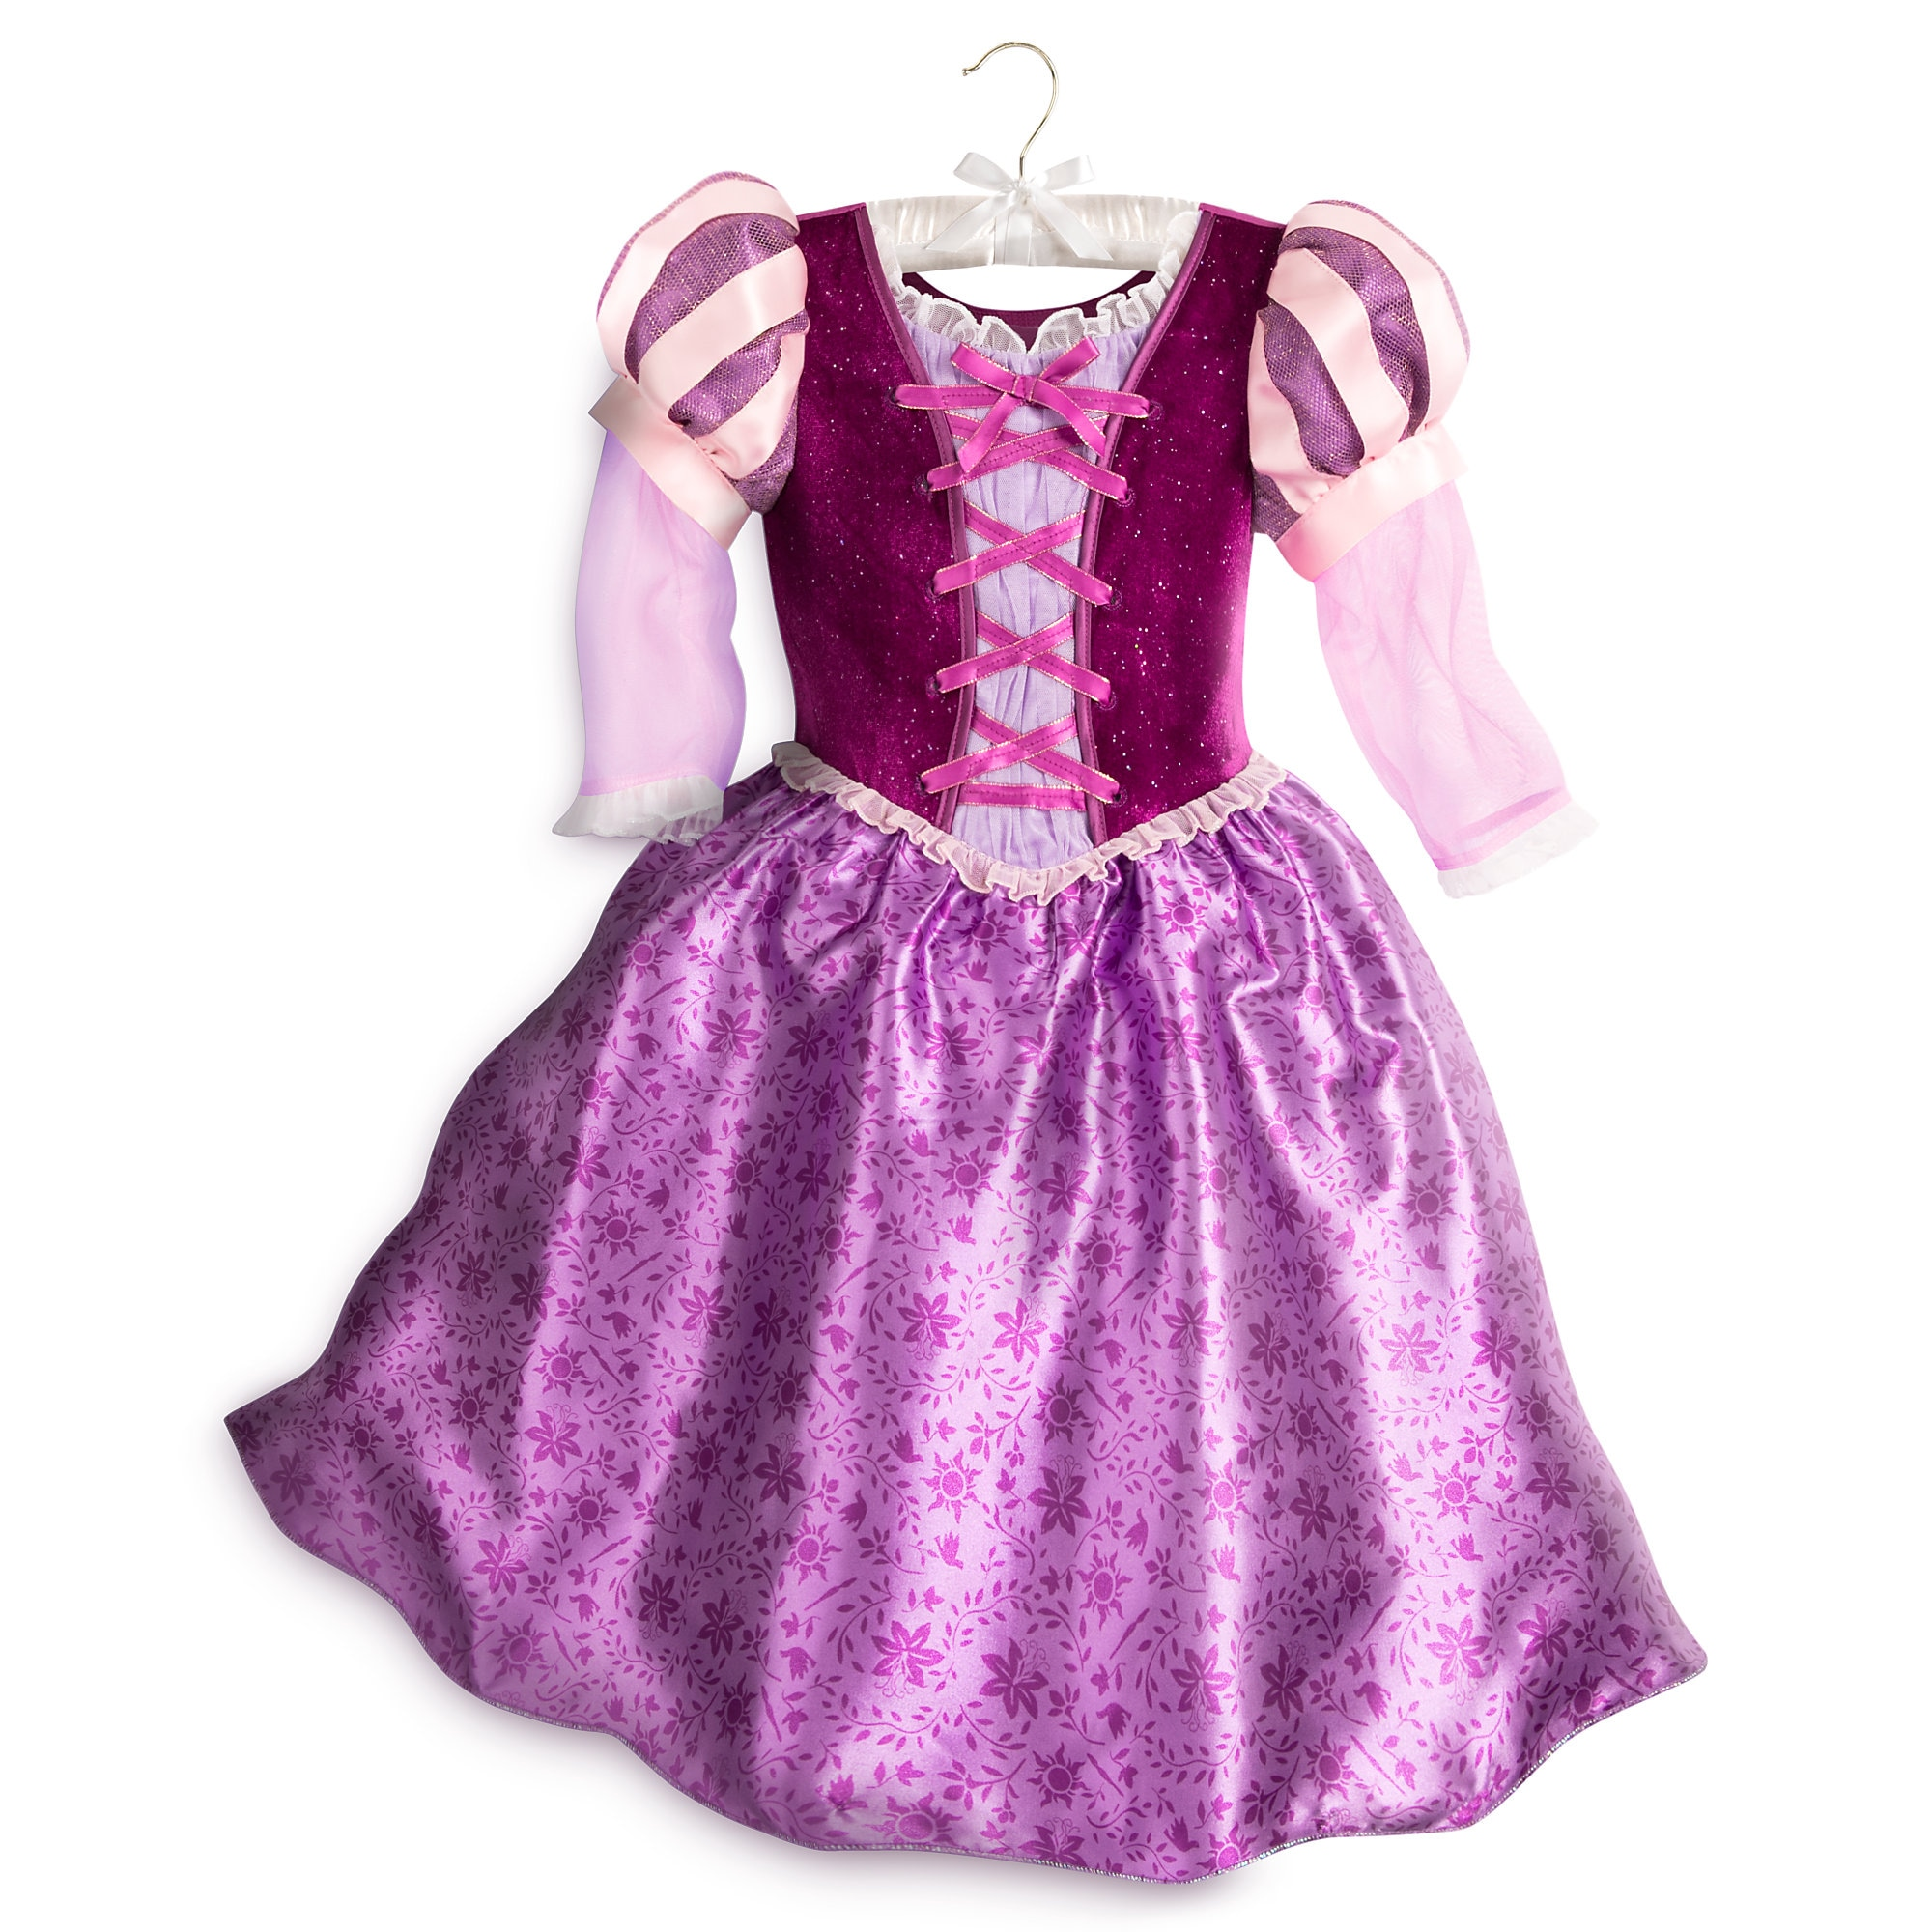 Product Image of Rapunzel Costume for Kids - Tangled The Series # 1  sc 1 st  shopDisney & Rapunzel Costume for Kids - Tangled: The Series | shopDisney